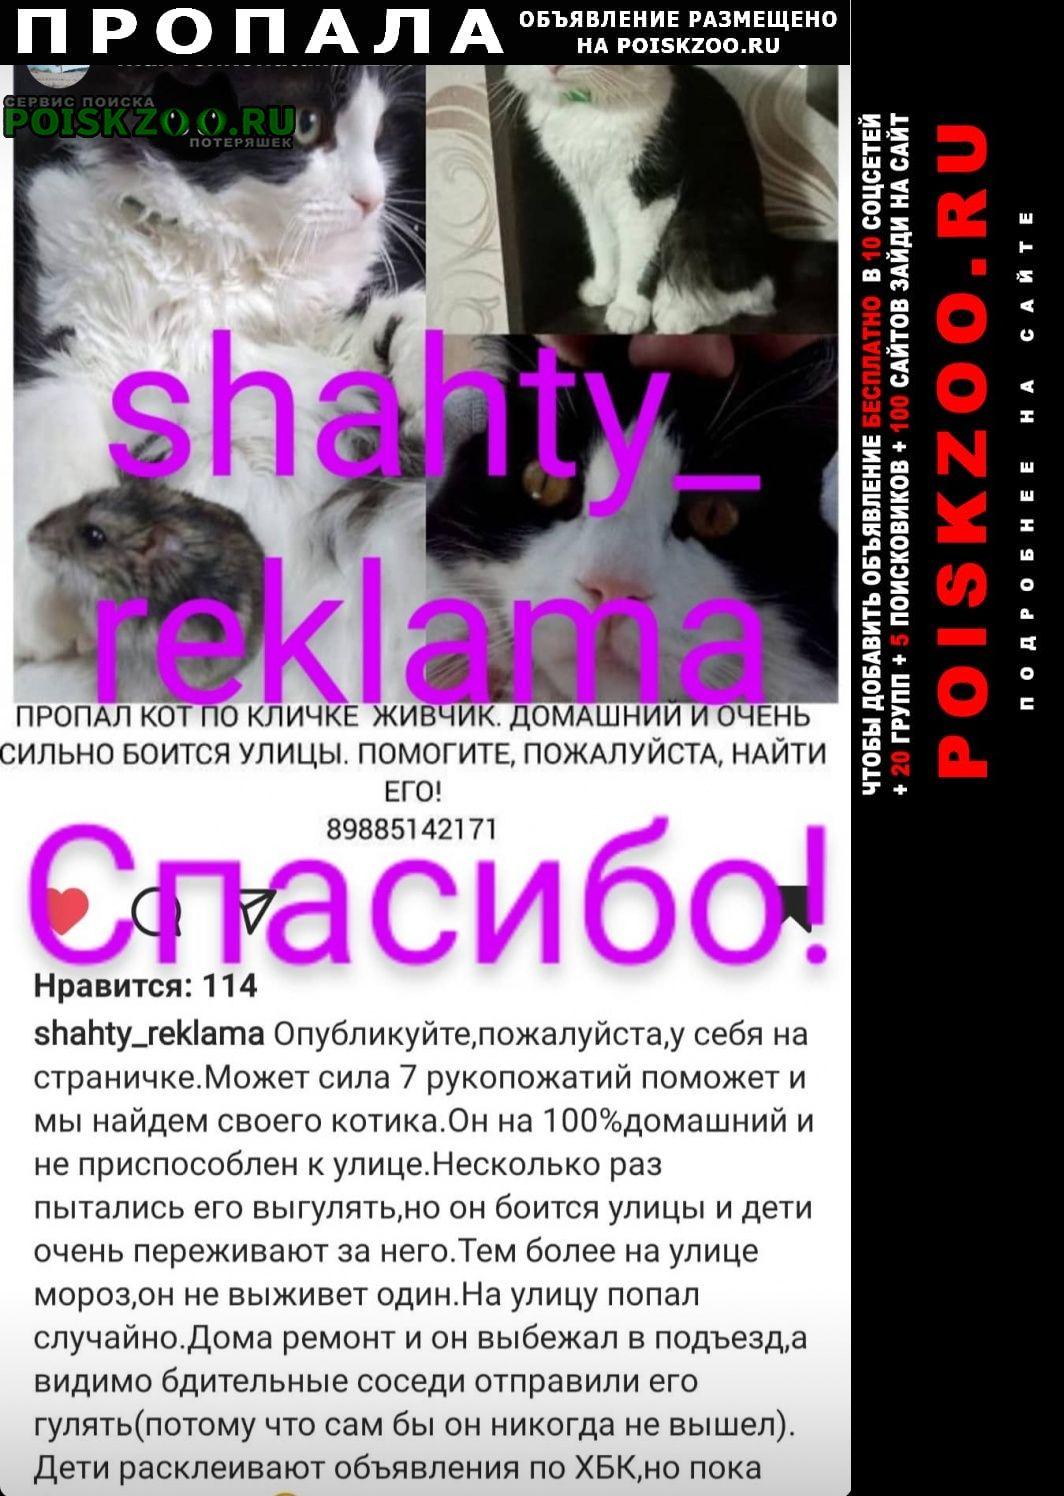 Пропала кошка район хбк Шахты